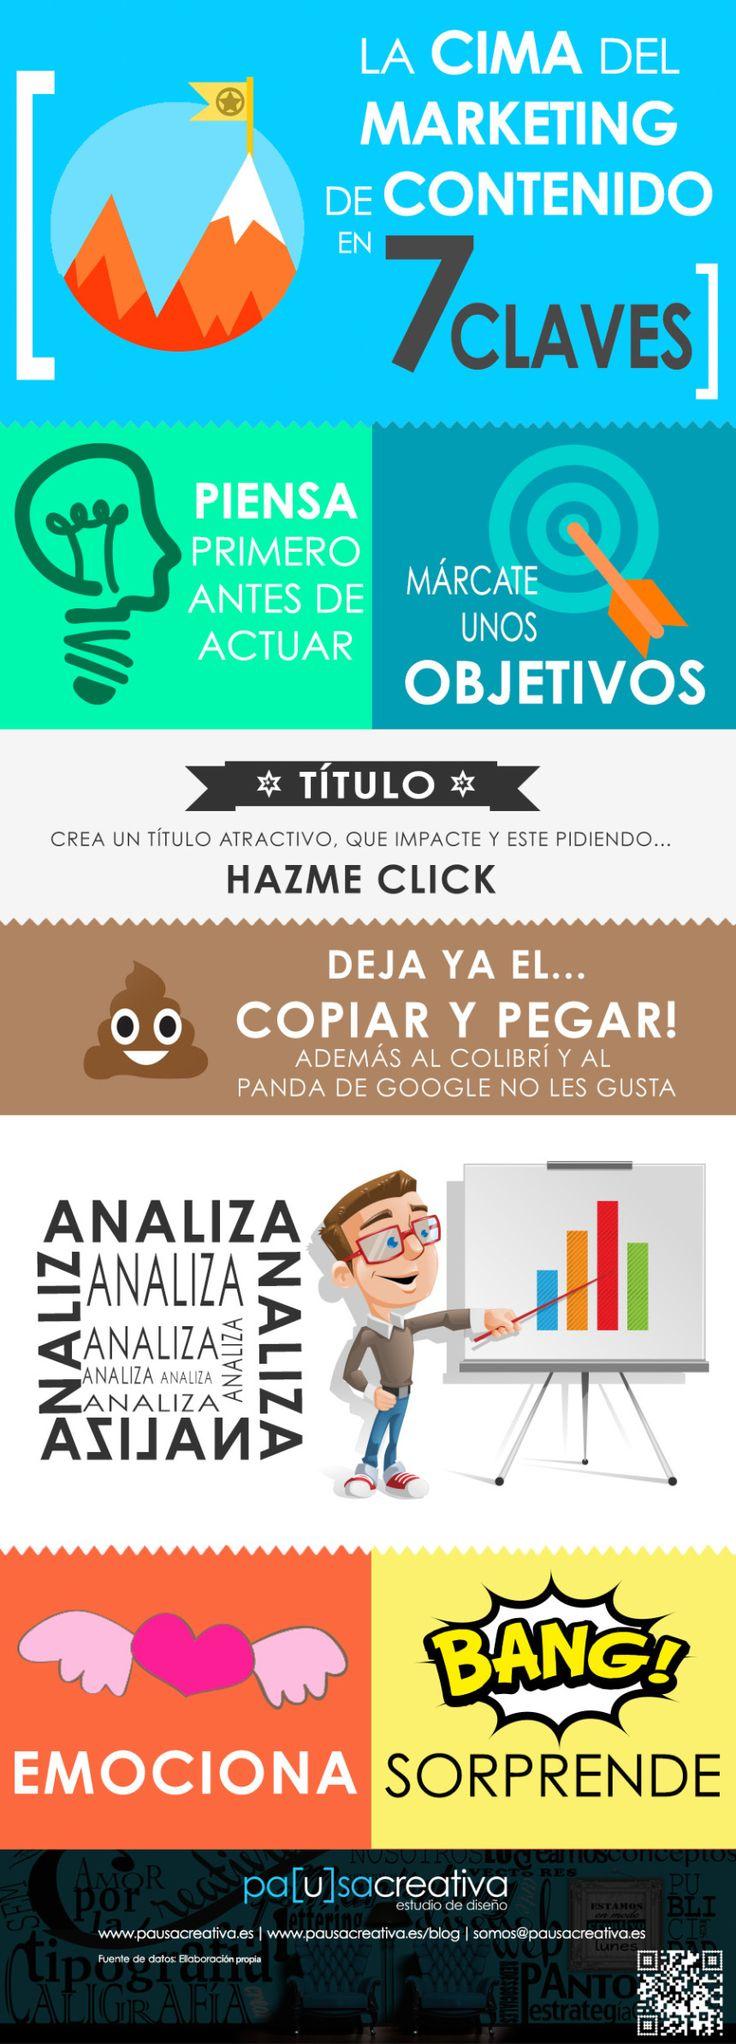 7 claves para llegar a la cima del marketing de contenido #infografia #infographic #marketing